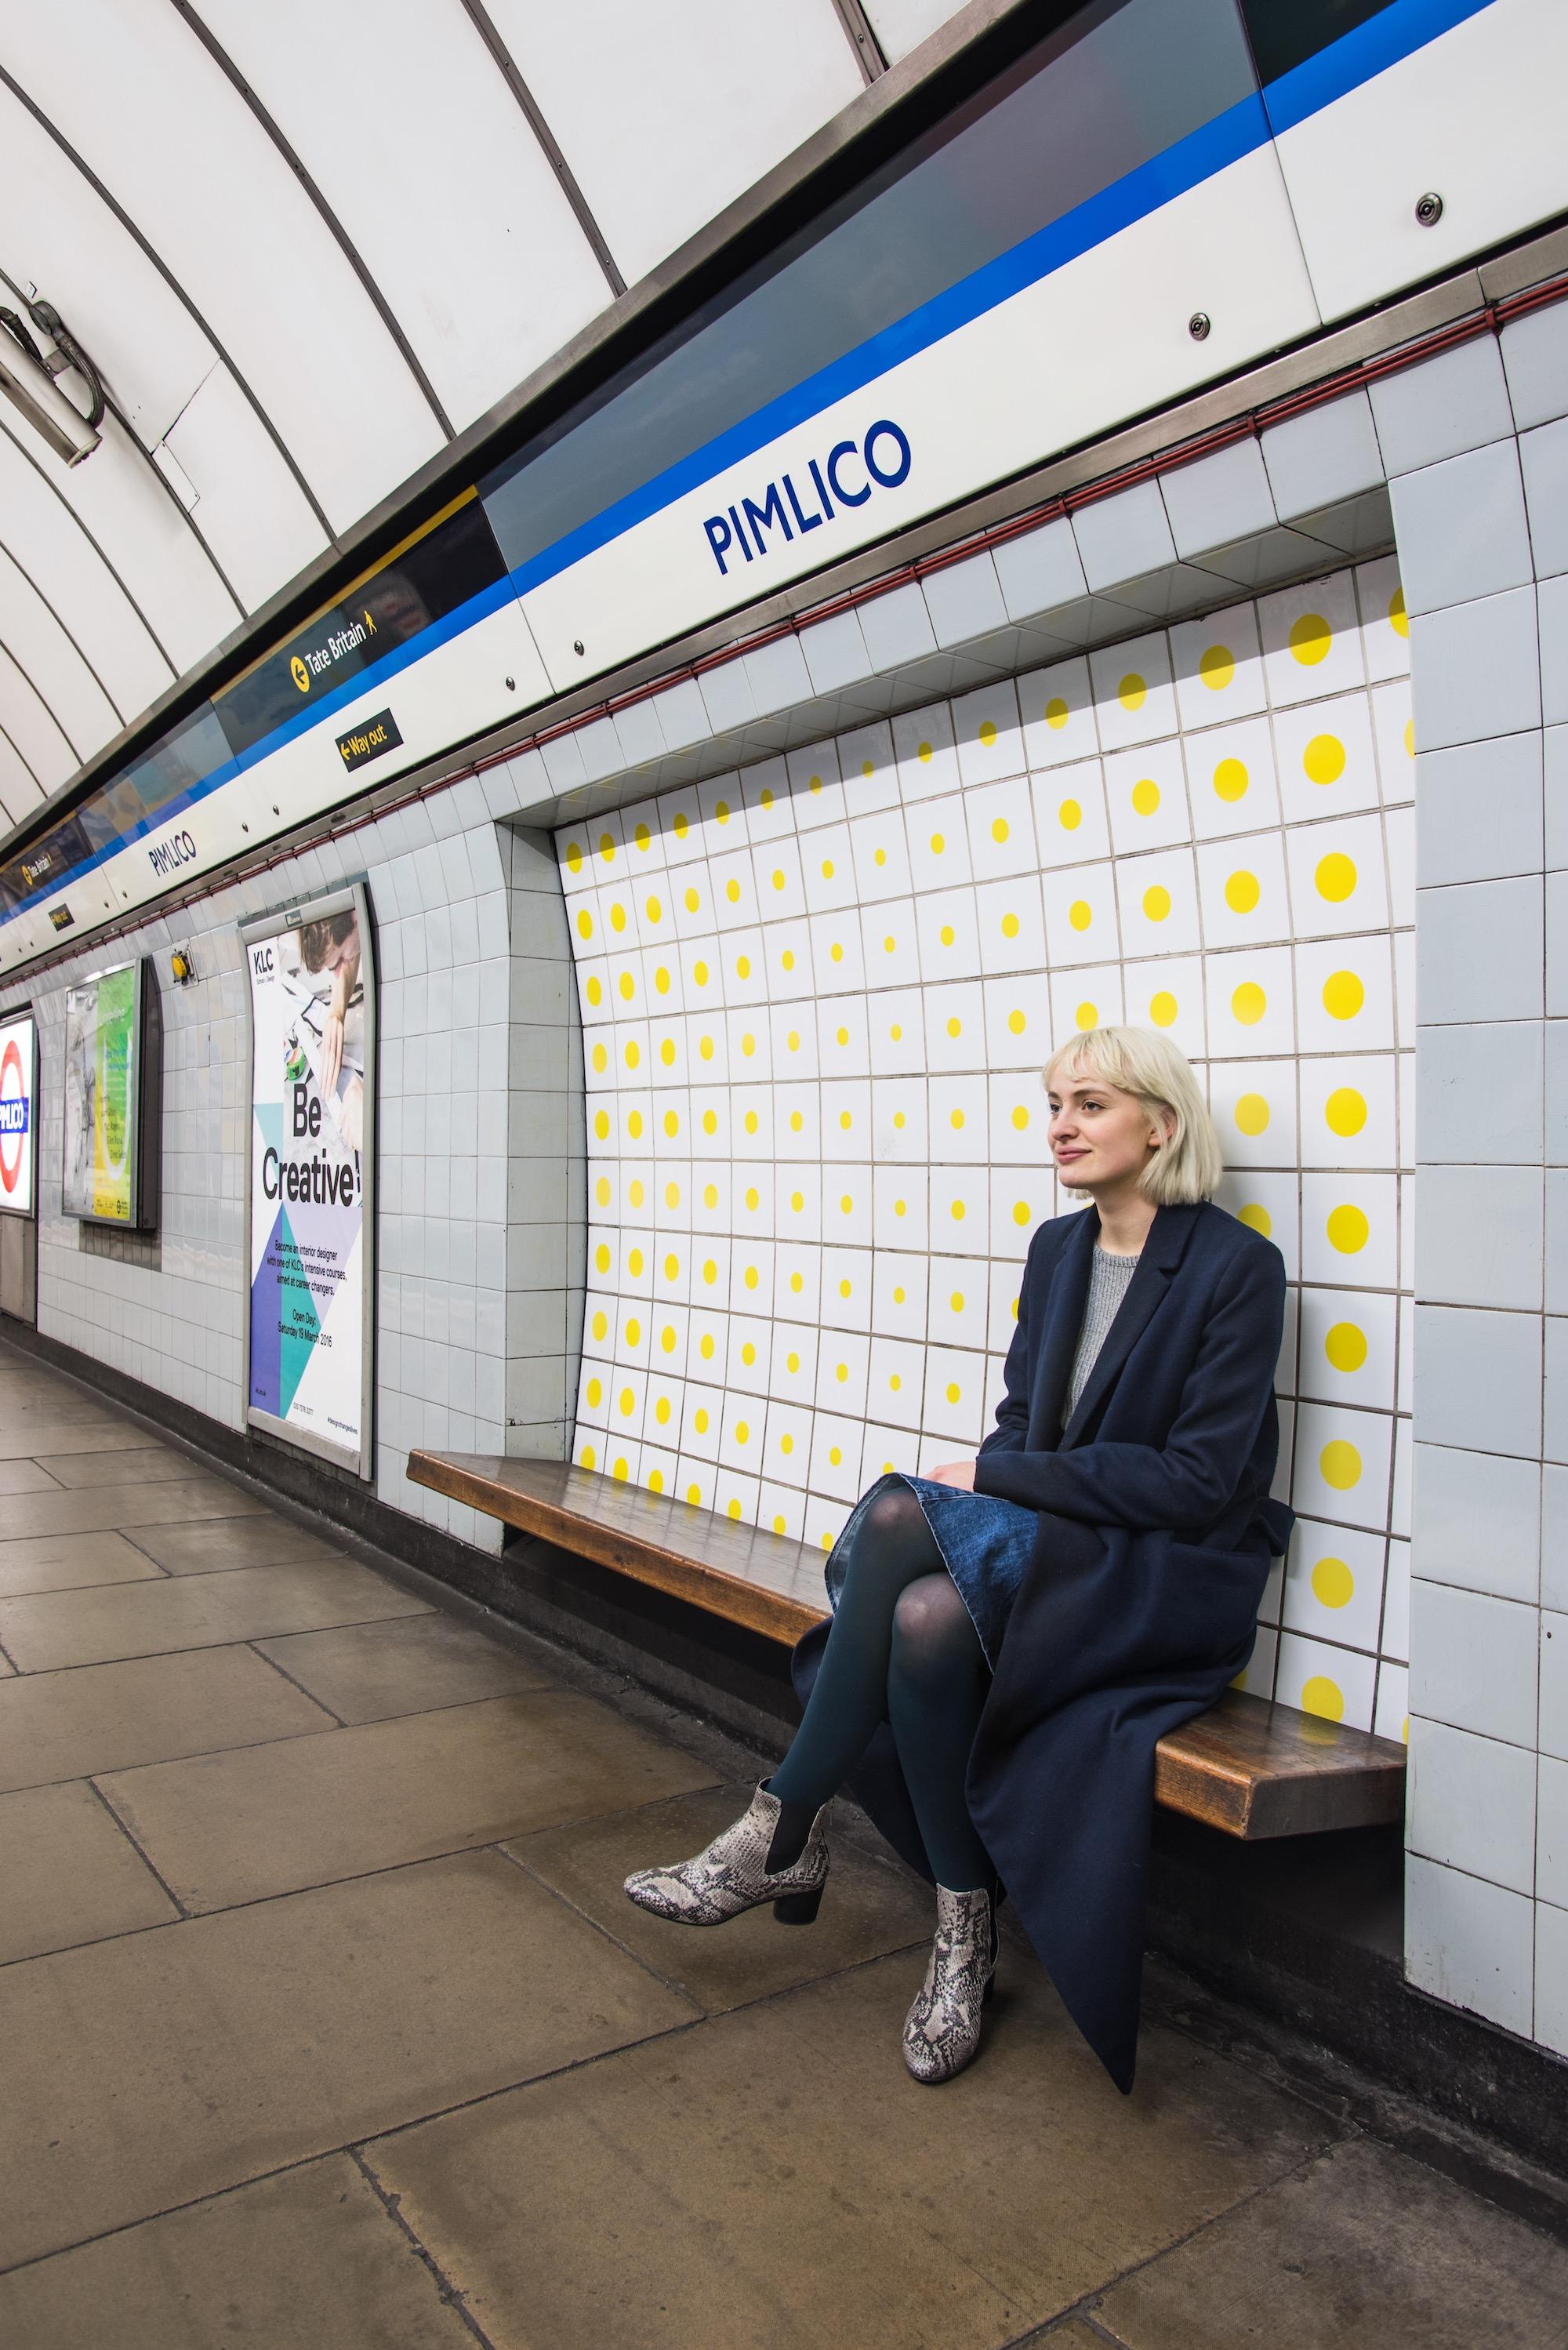 Peter Sedgley tiles at Pimlico